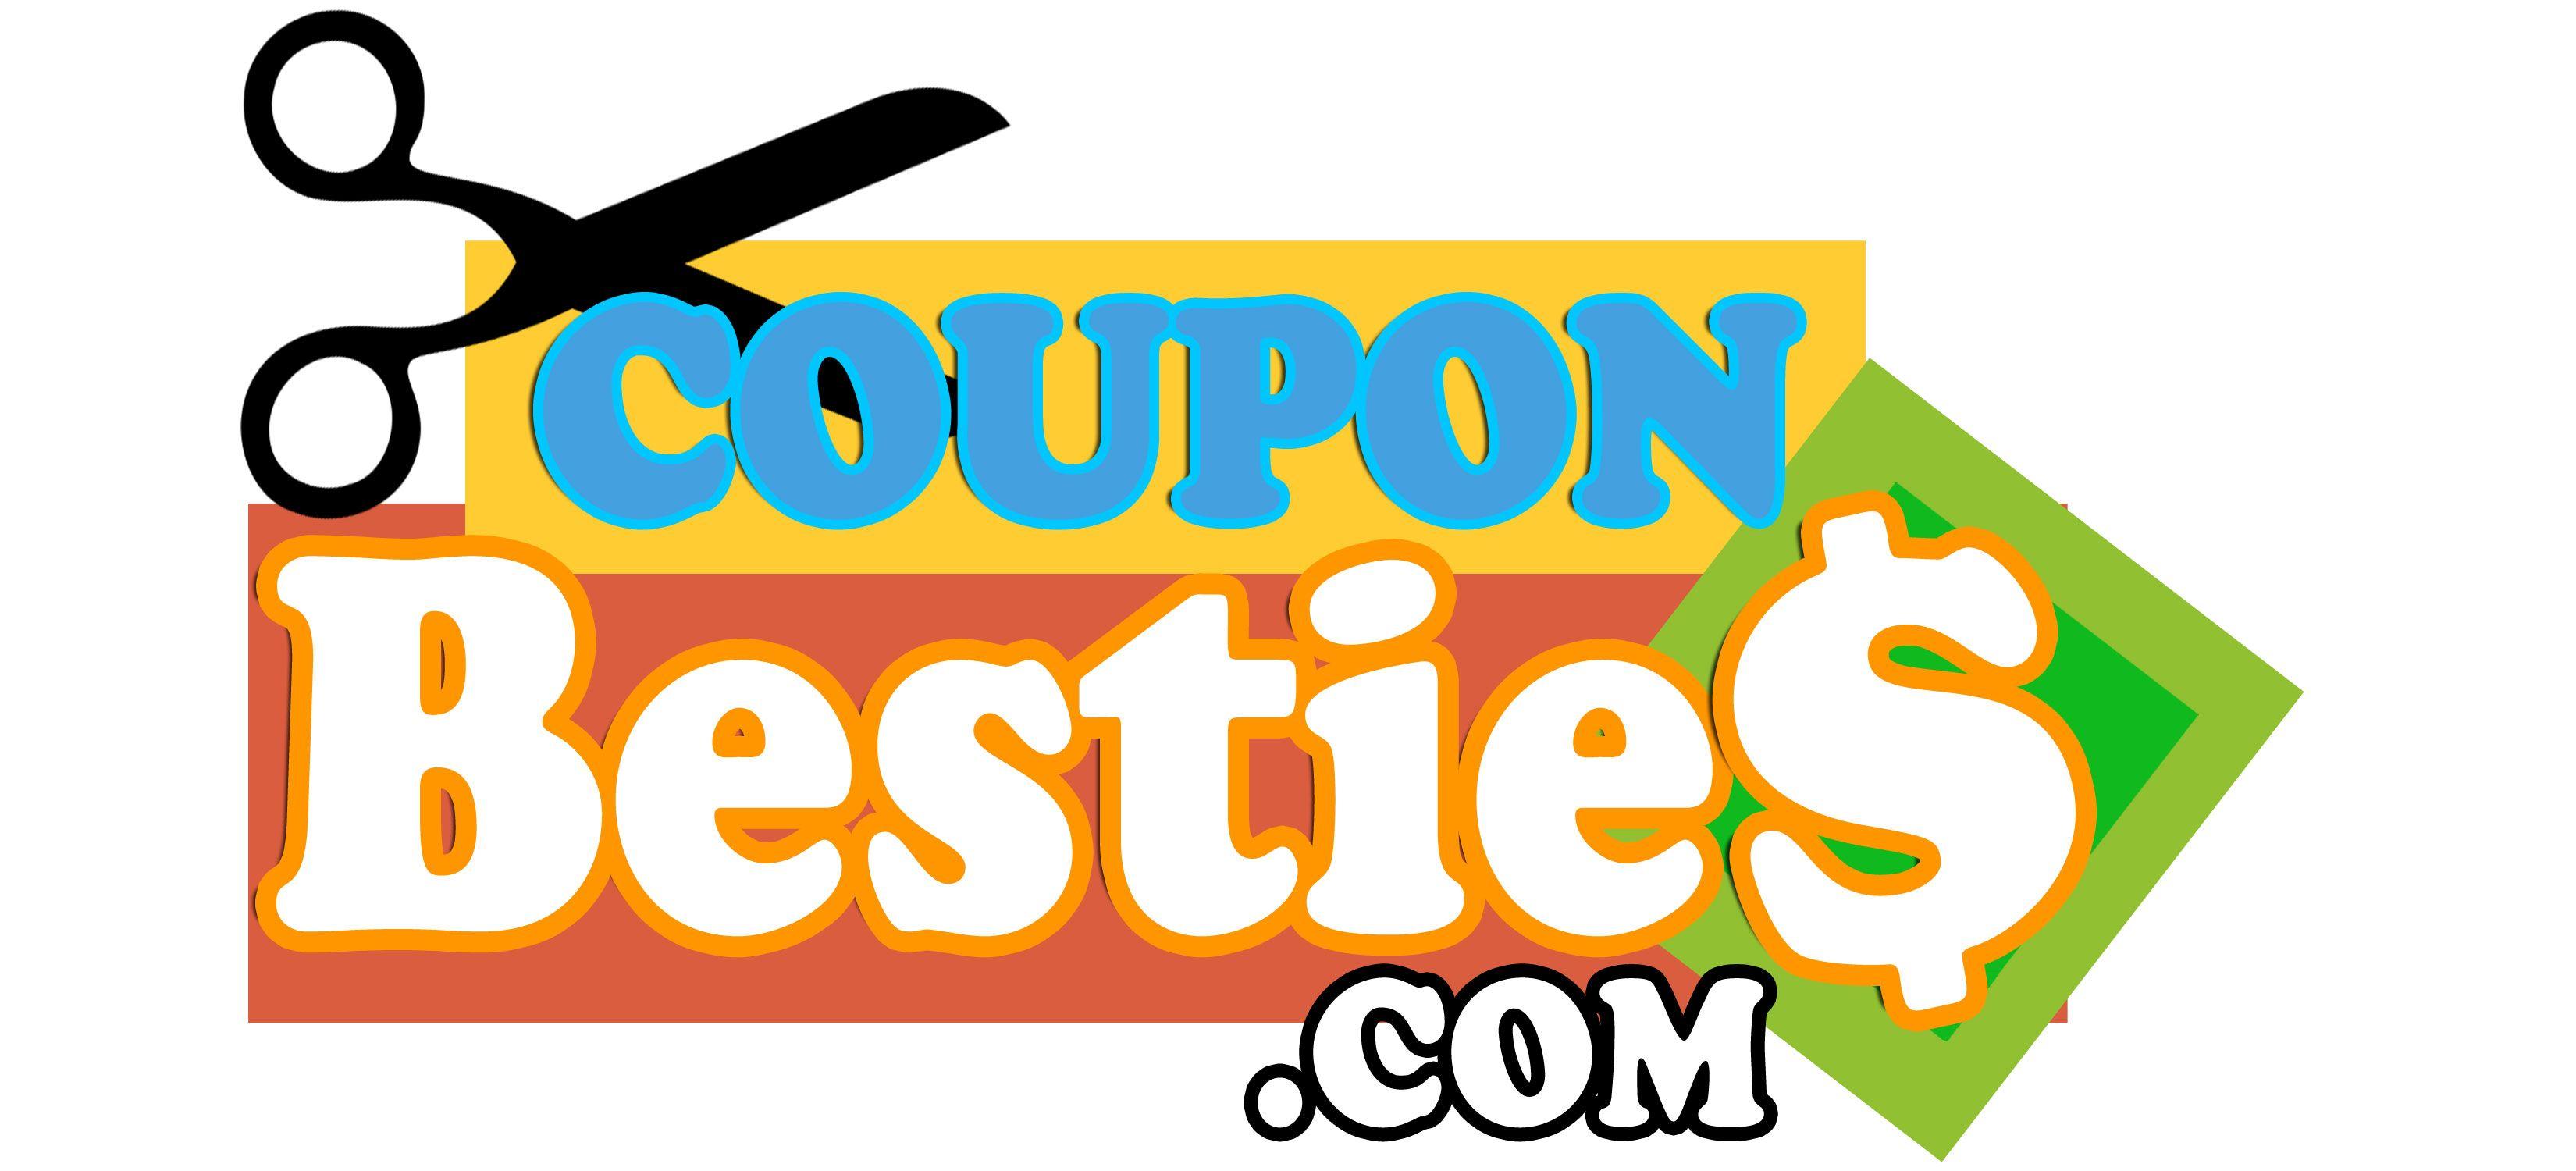 estoscuponescom printable manufacturer coupons